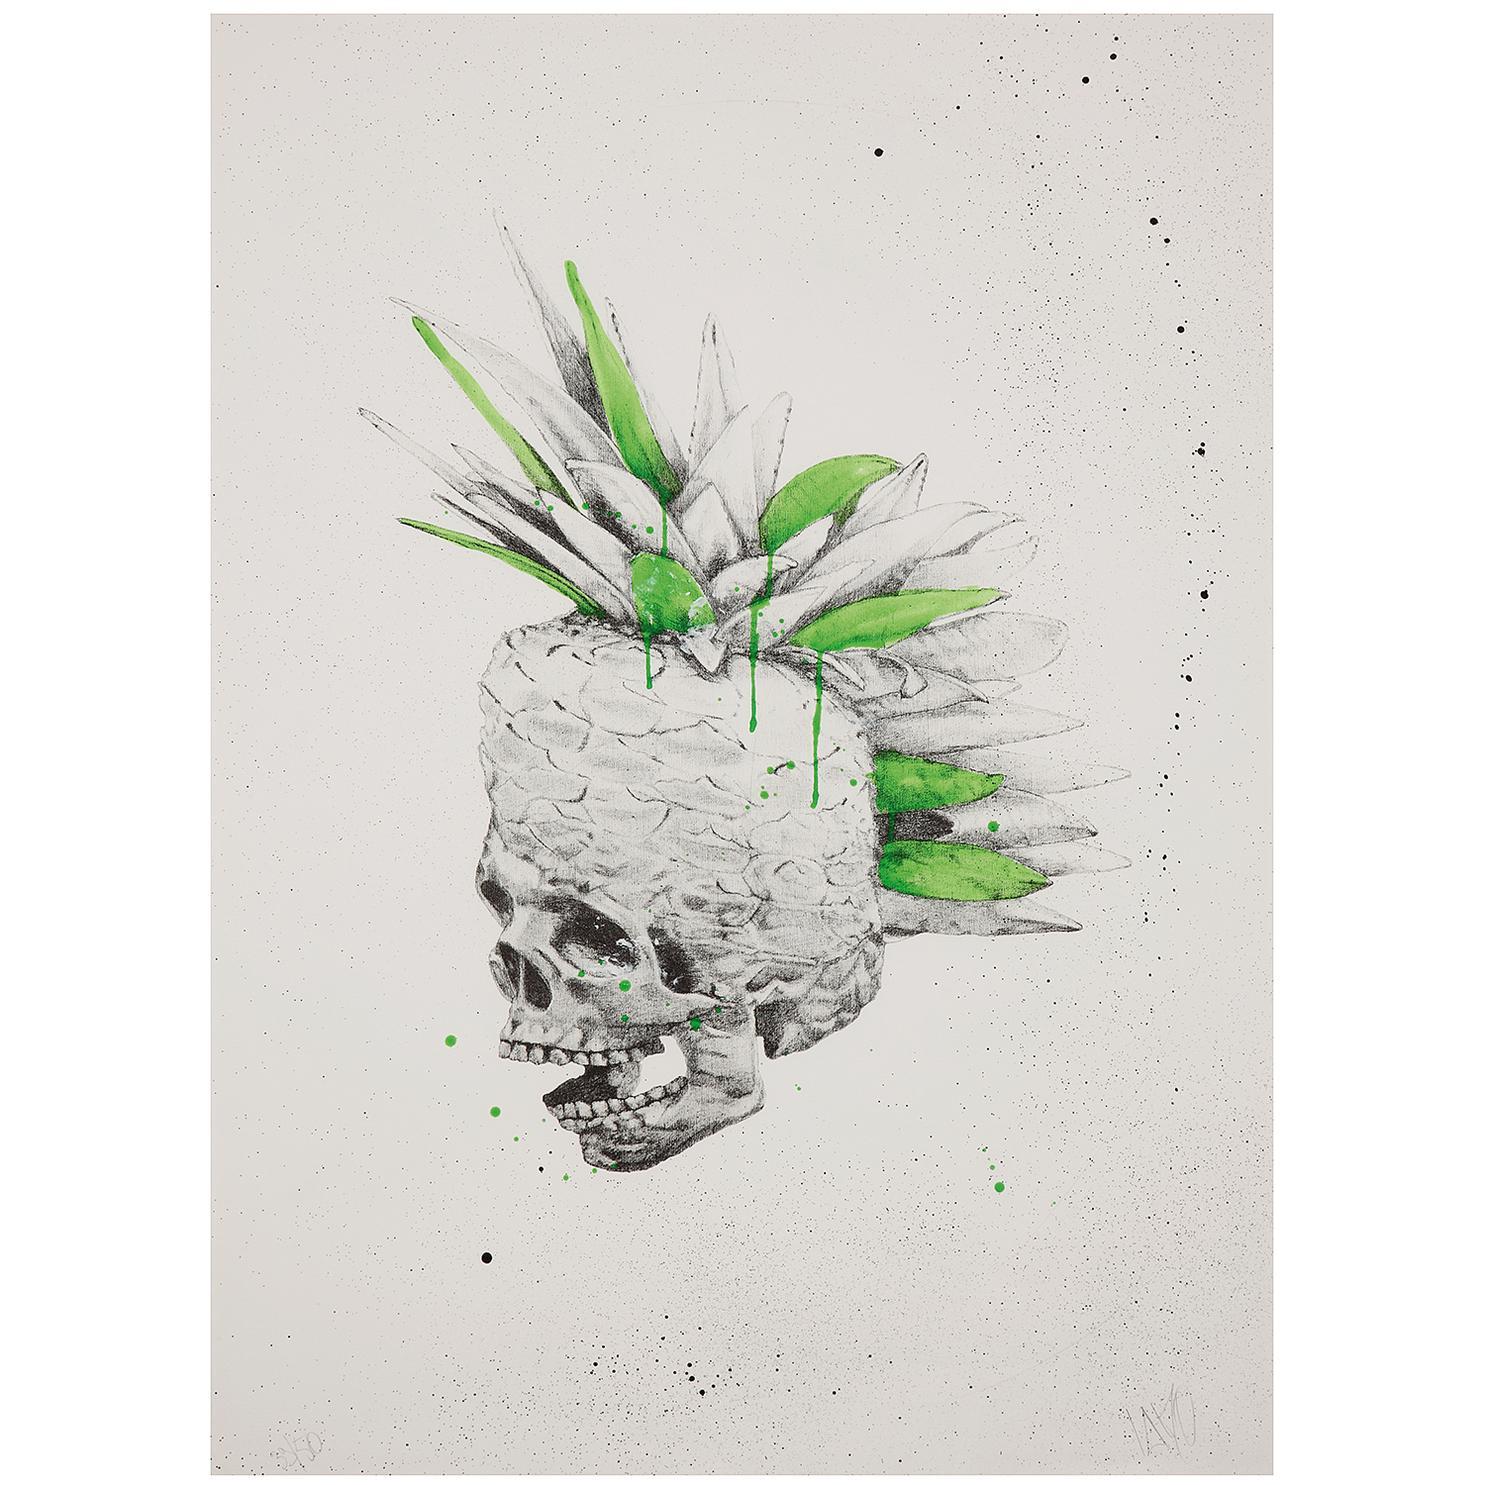 Ludo-Punk Pineapple-2013